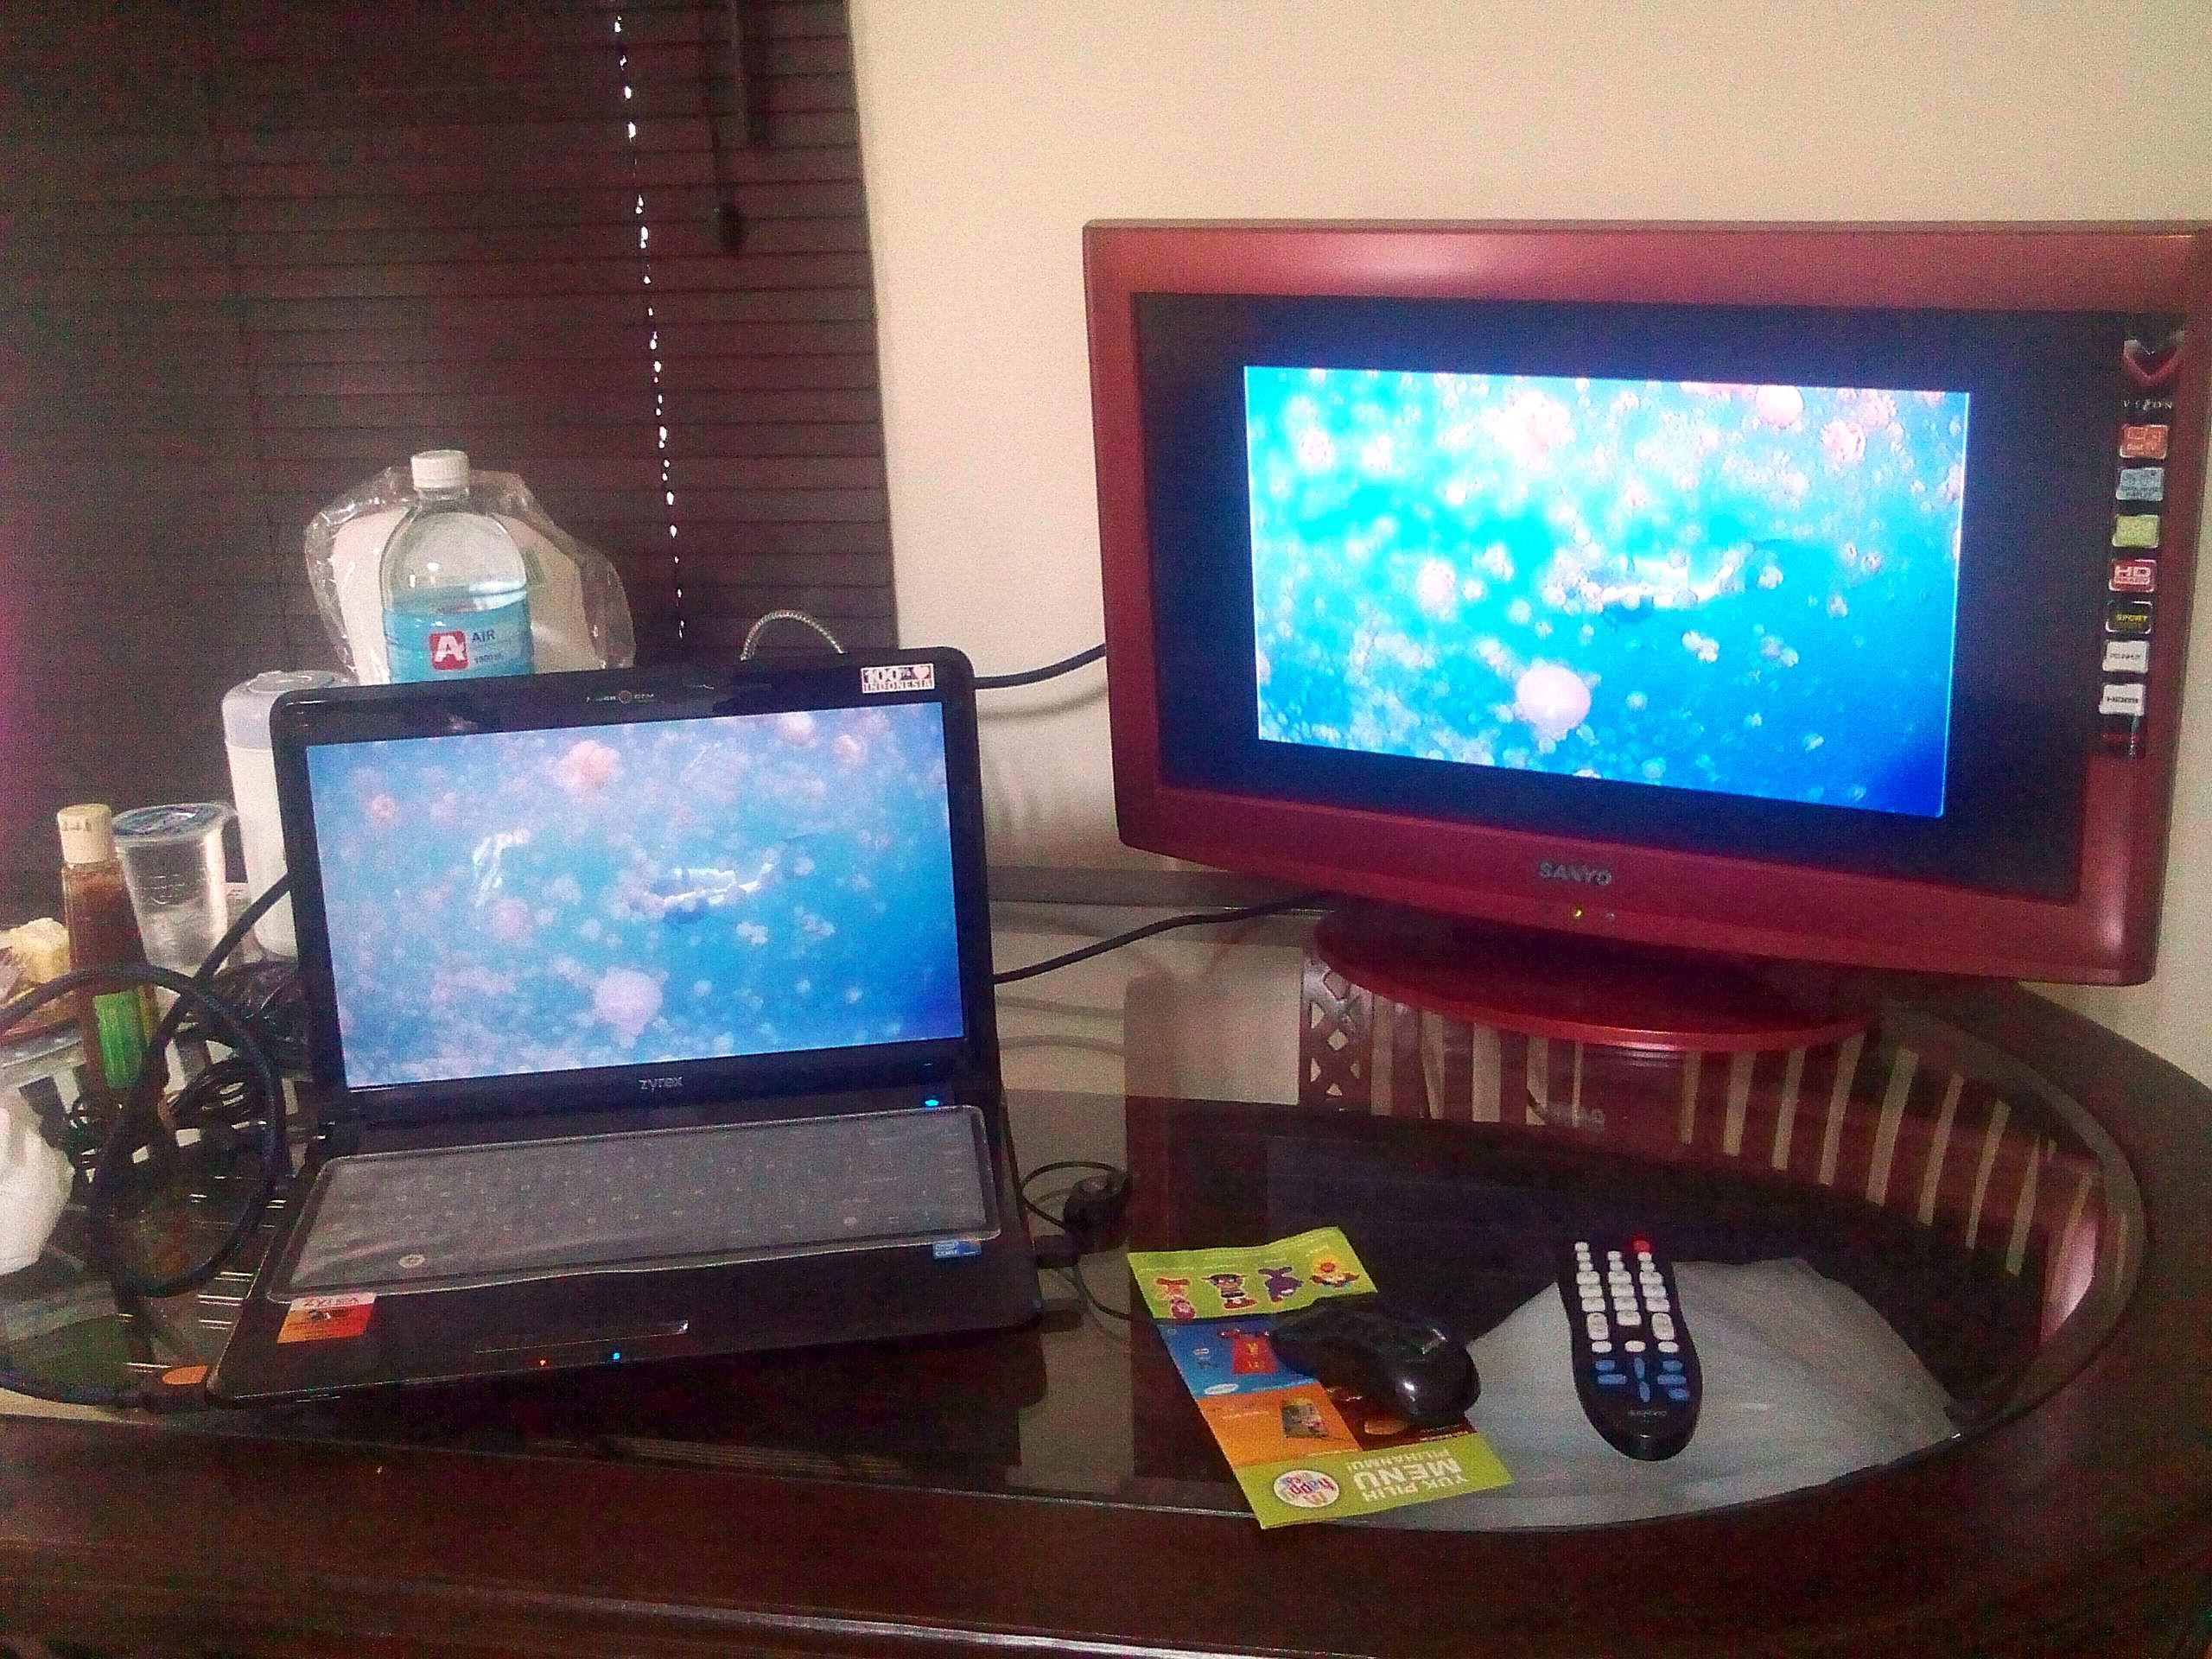 Koneksi Laptop Dg TV LCD Menggunakan Kabel HDMI